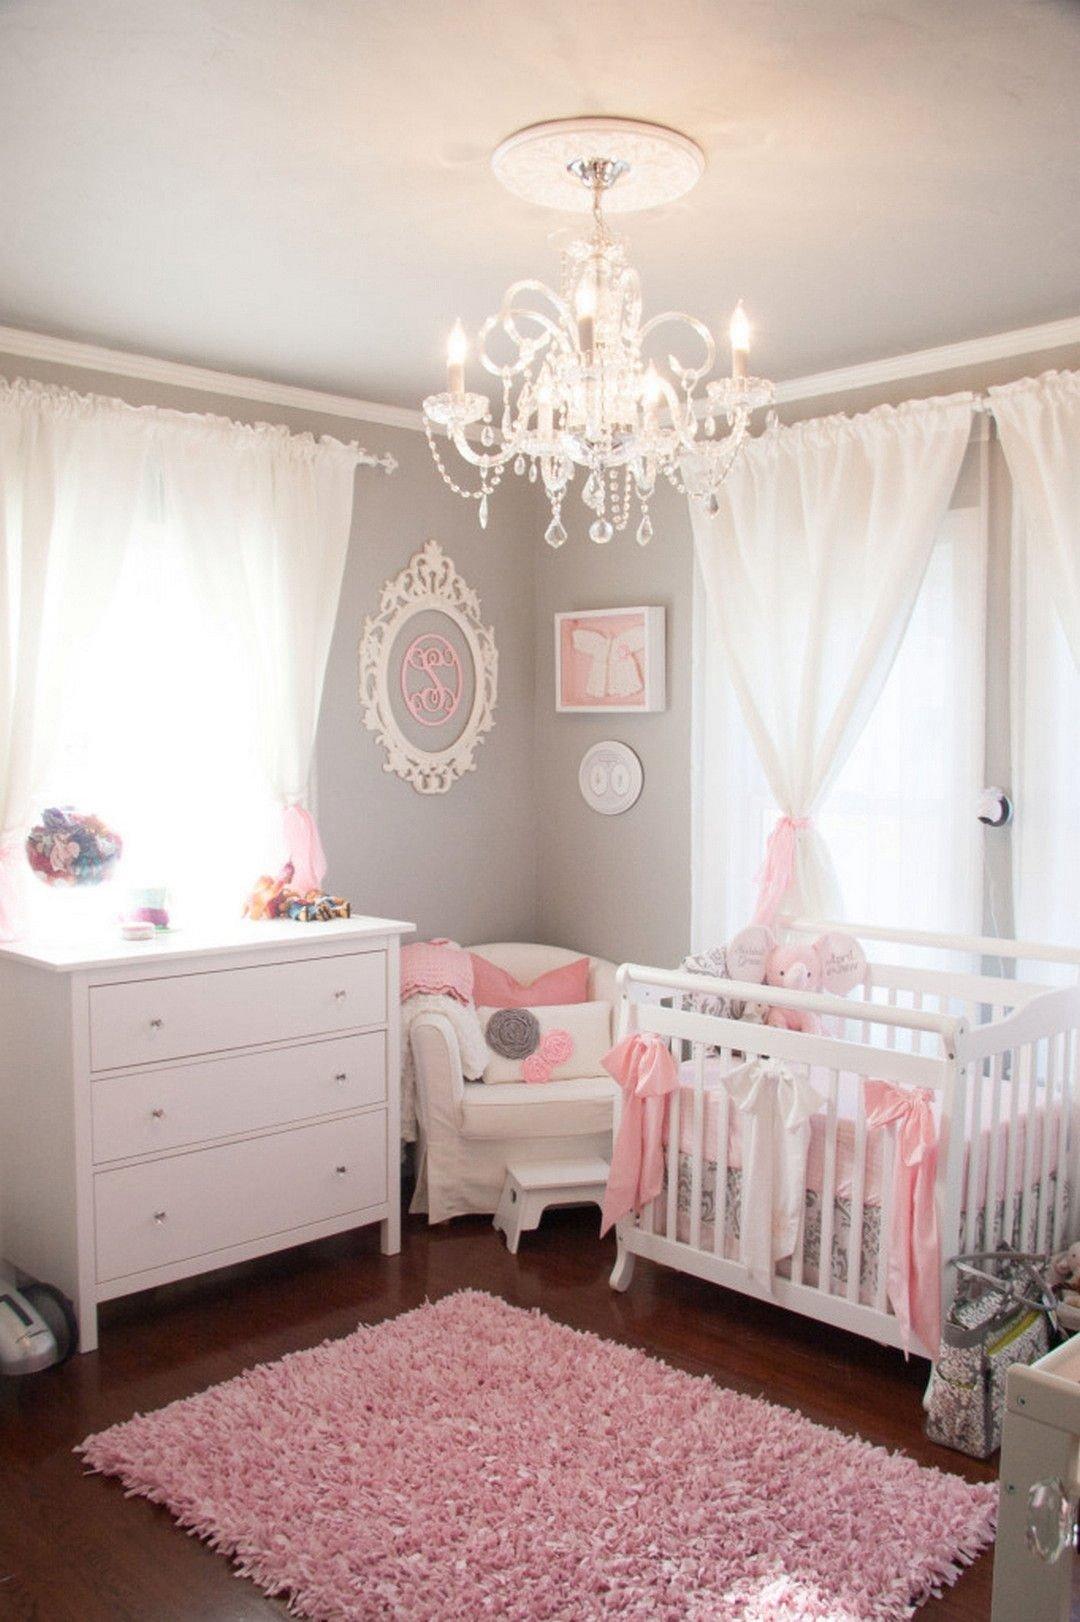 10 Amazing Cute Baby Girl Room Ideas 2021